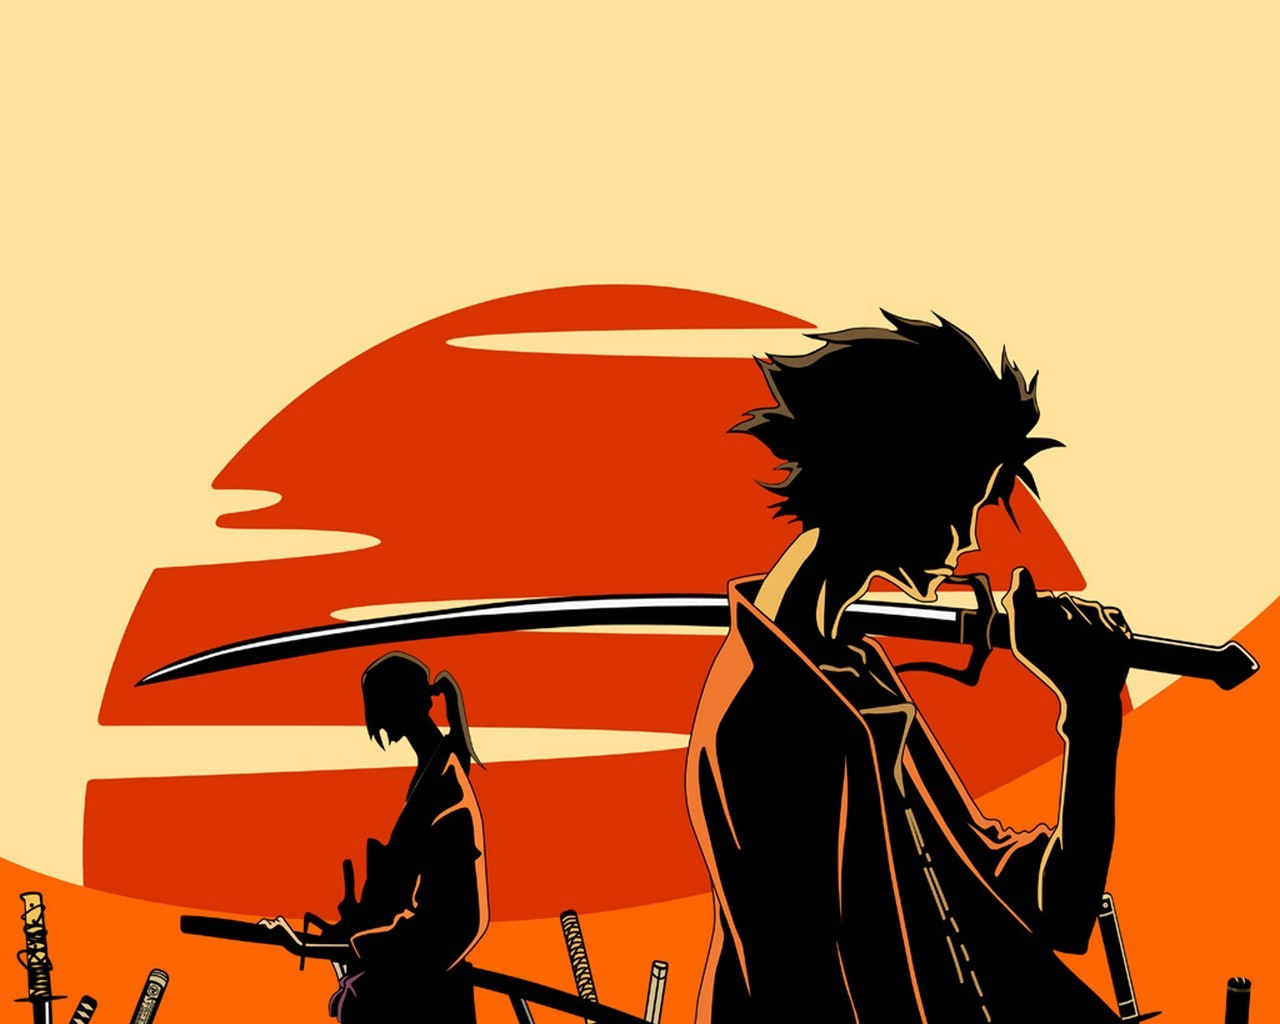 Samurai Champloo Wallpaper Hd Samurai Champloo Mugen Wallpapers Hd Desktop And Mobile